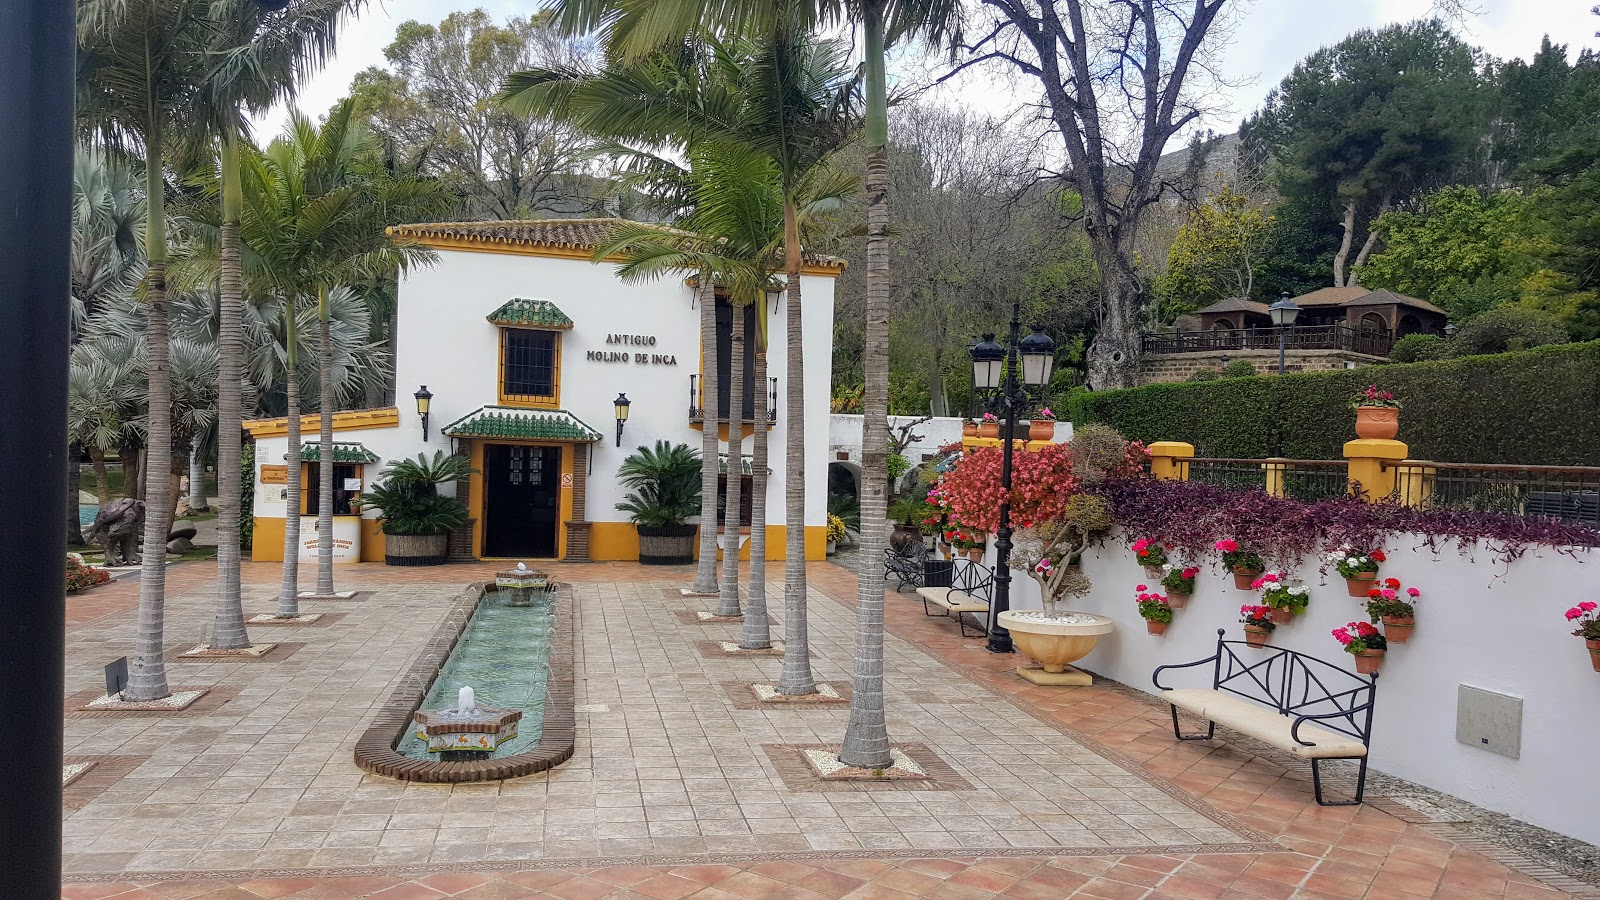 Visit Jardin Botanico Molino de Inca on your trip to ...